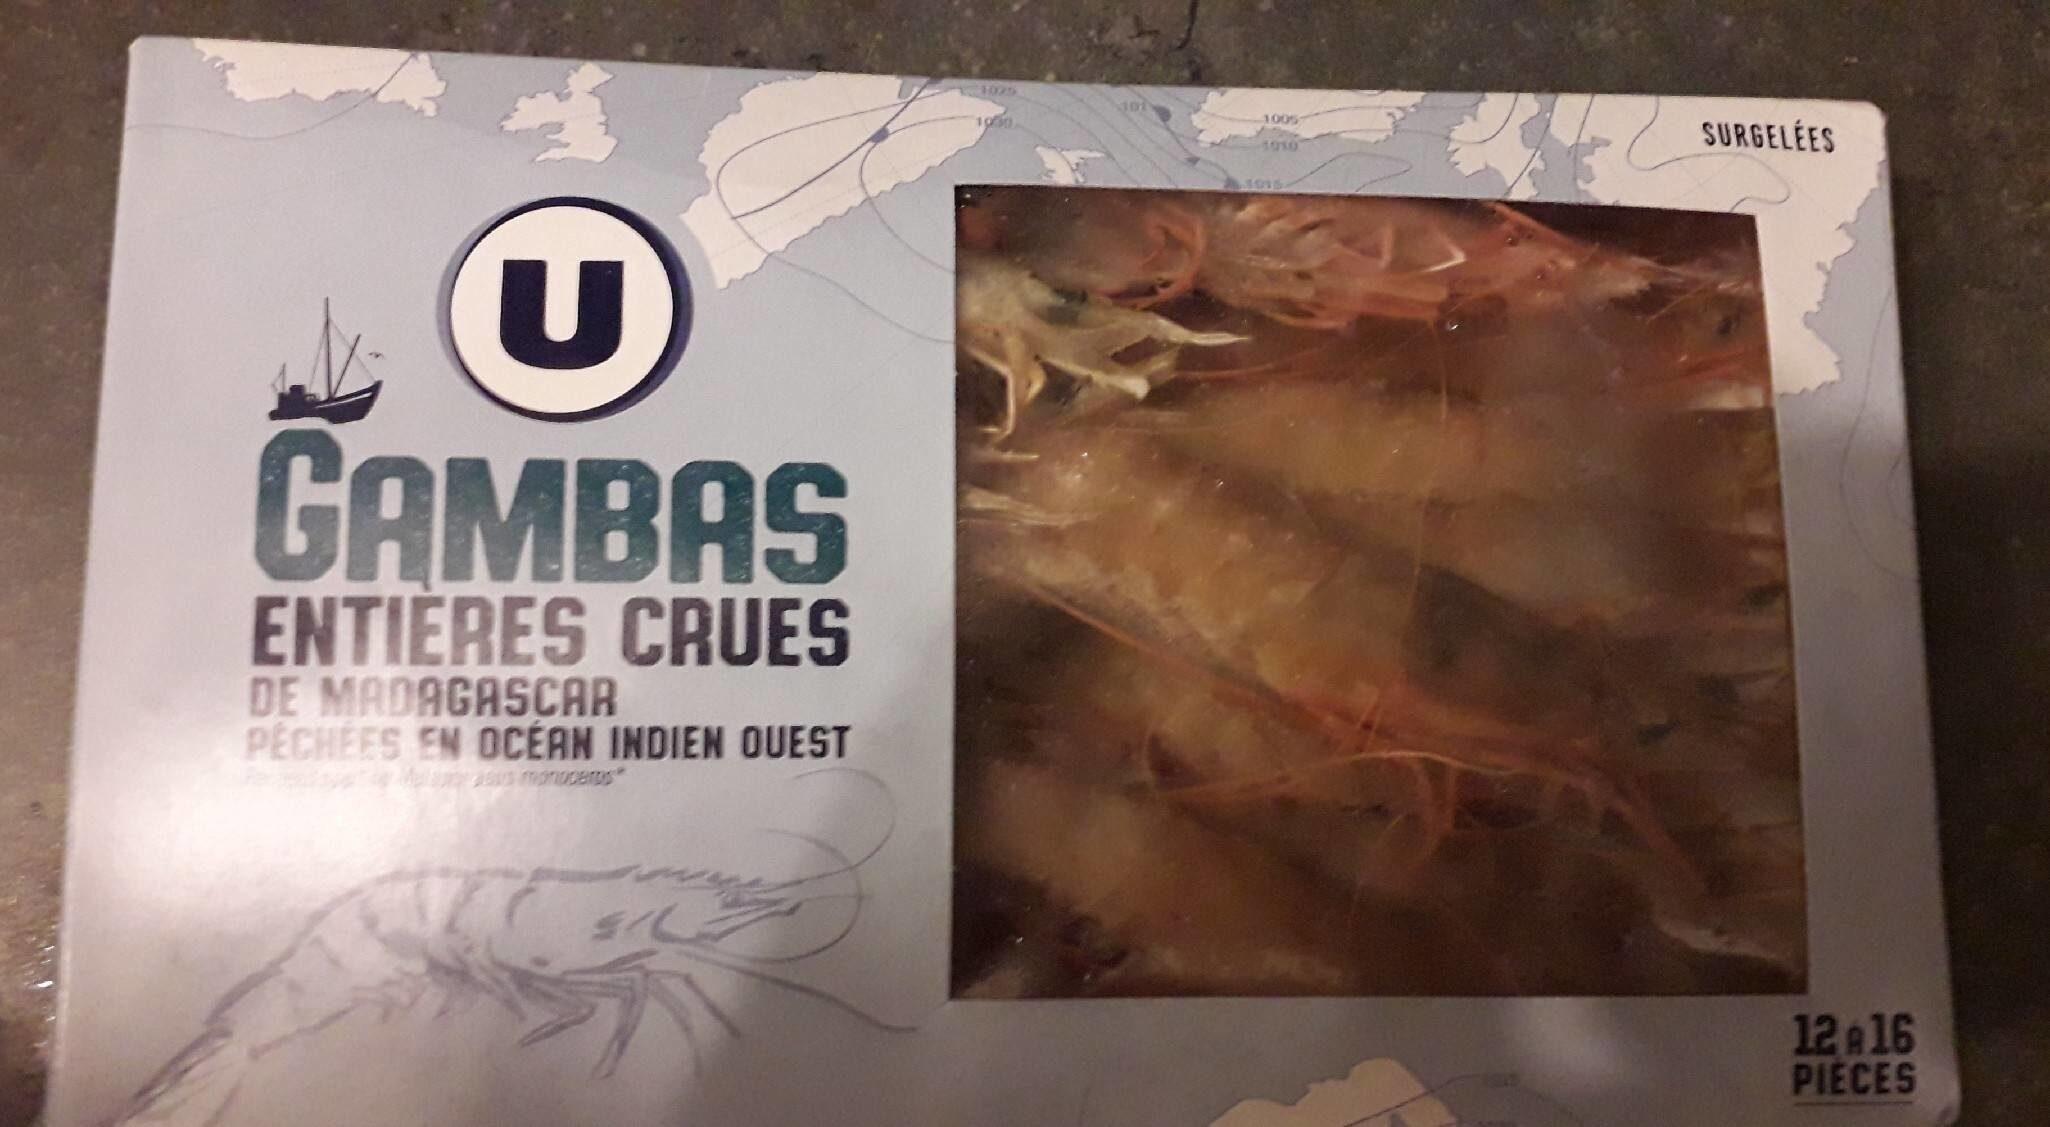 Gambas sauvages entières crues de Madagascar 12/16 - Product - fr